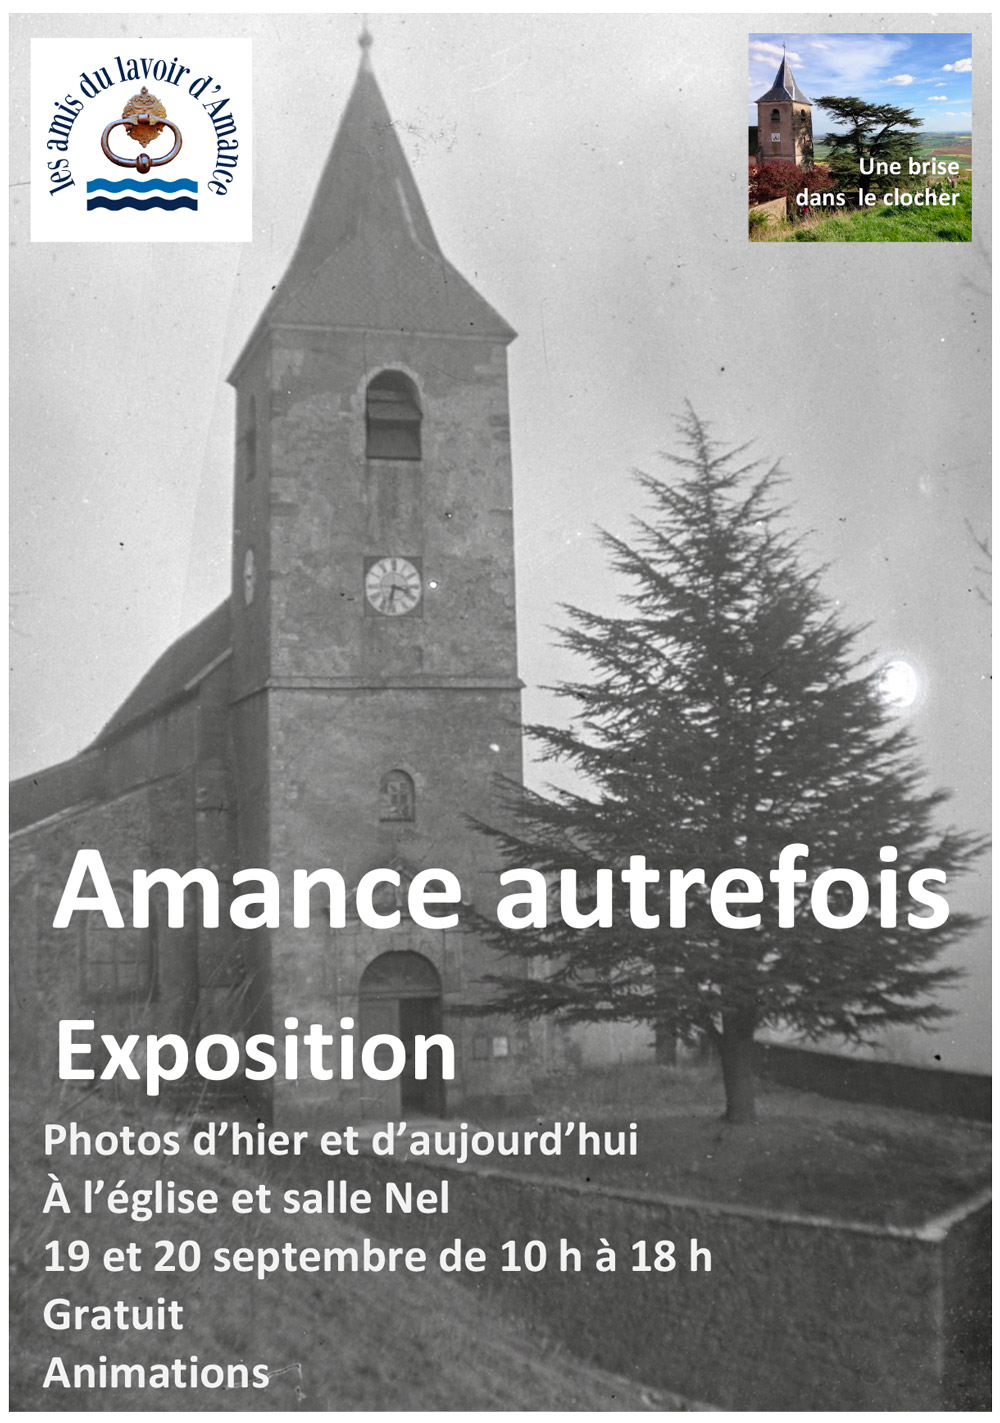 Exposition photos - Amance autrefois